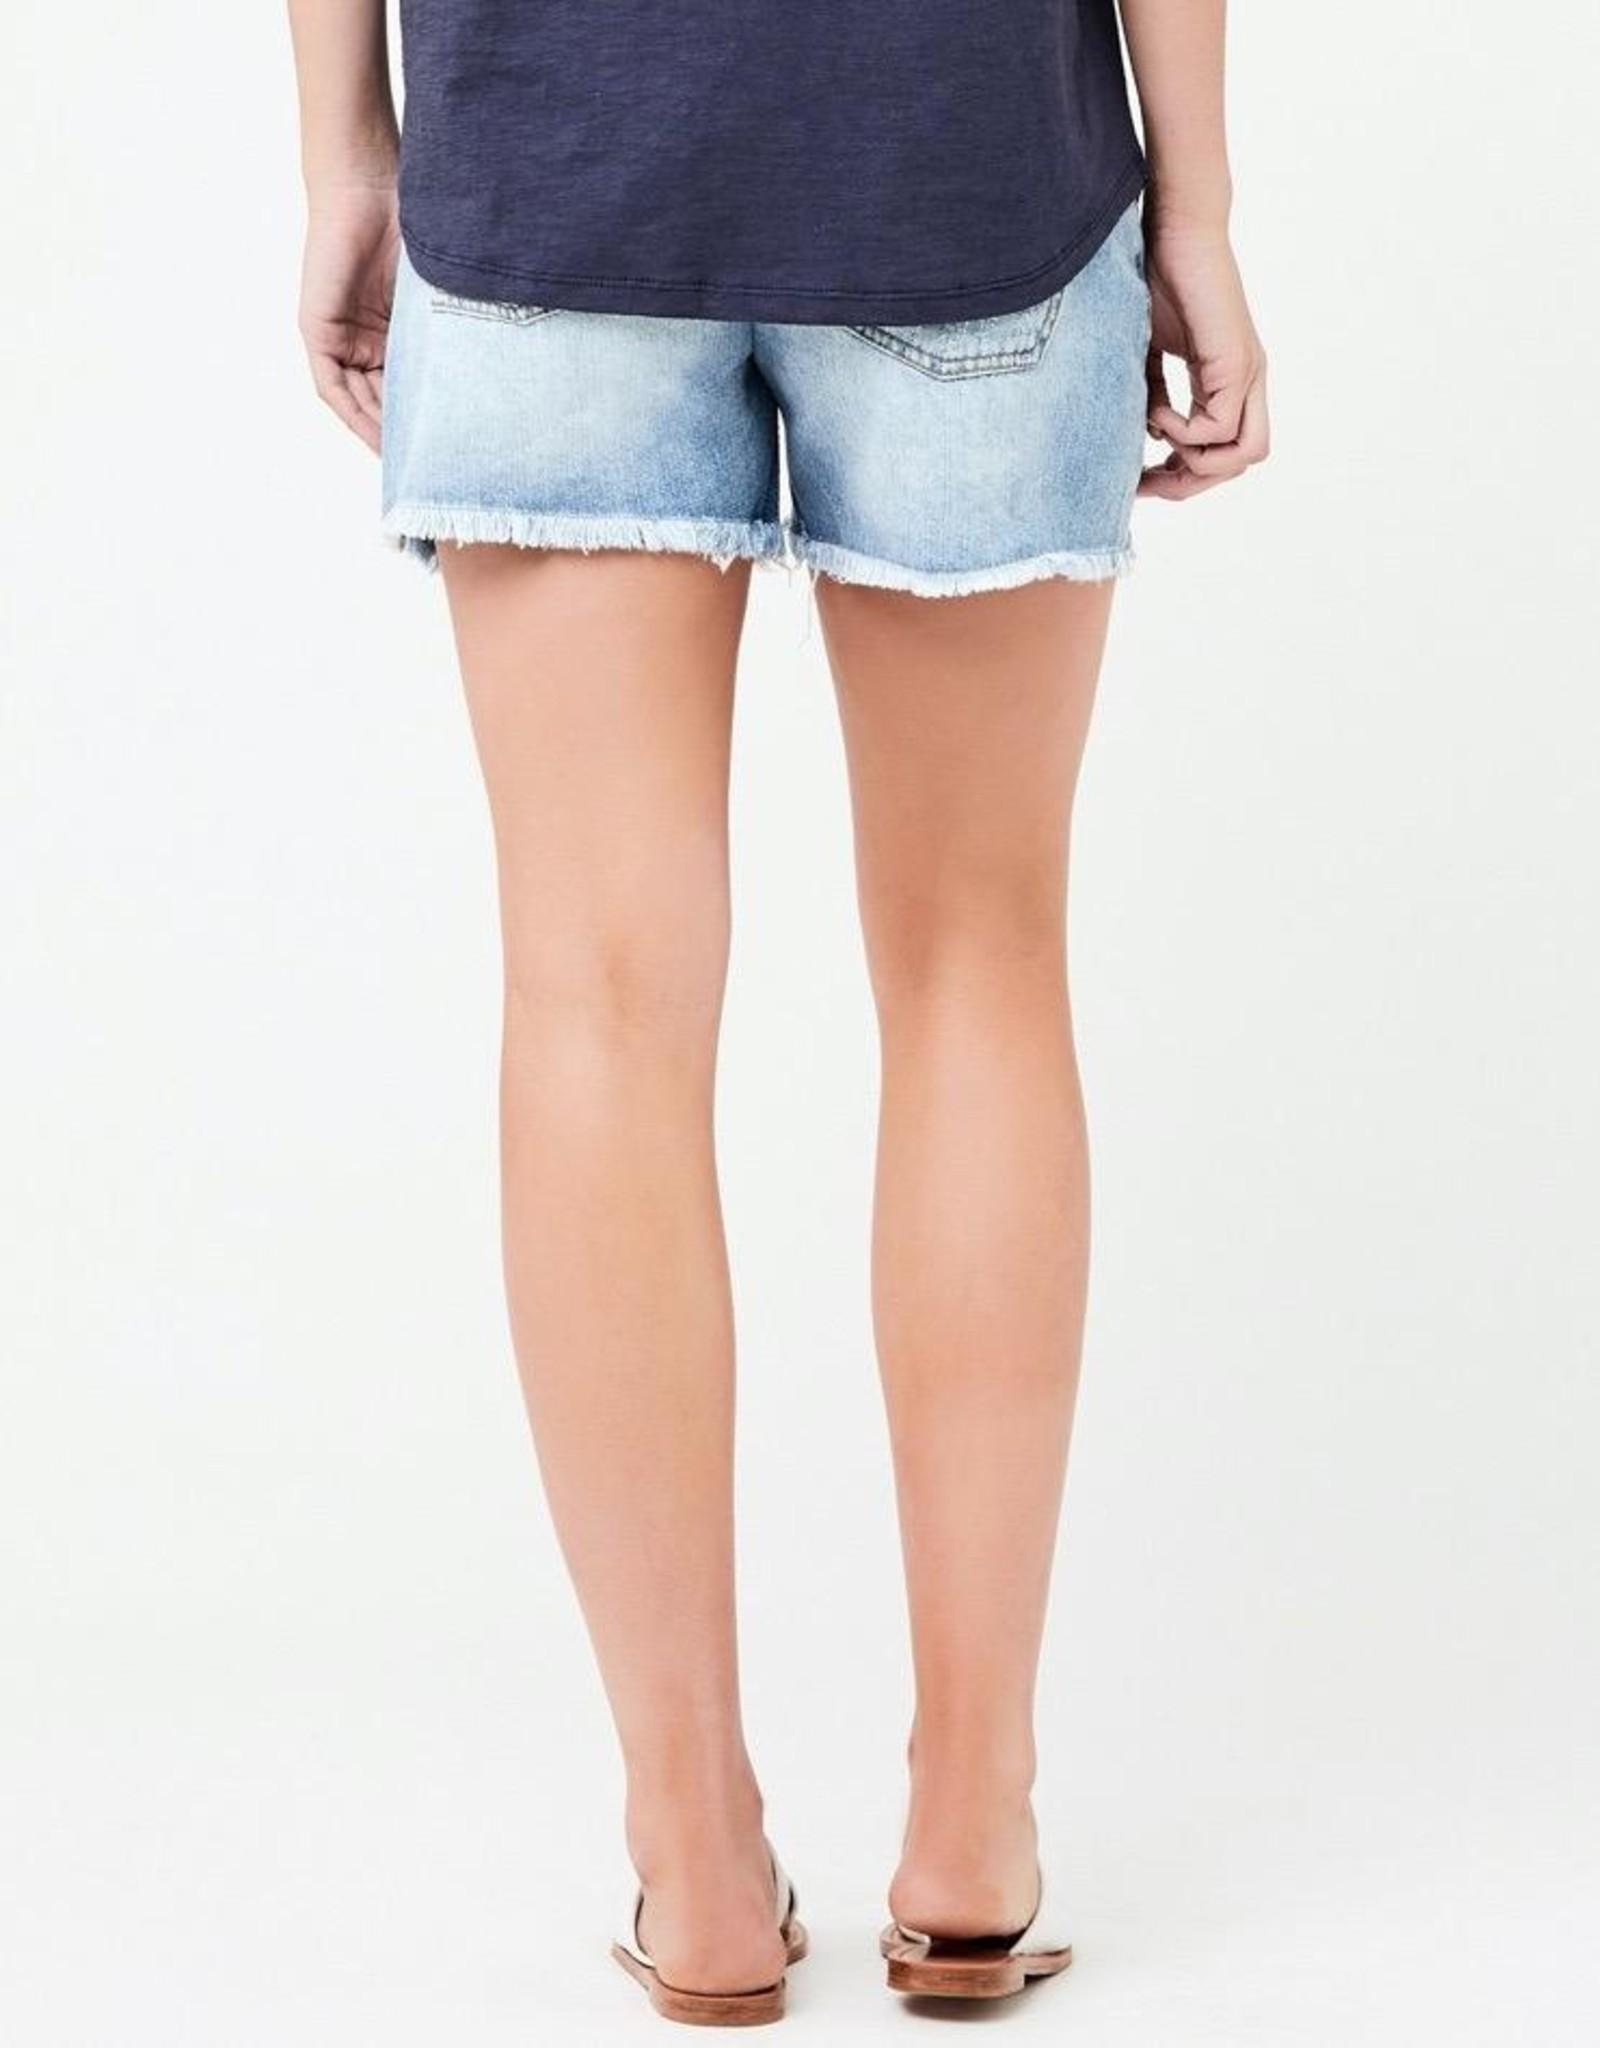 Ripe Maternity Distressed Denim Shorts